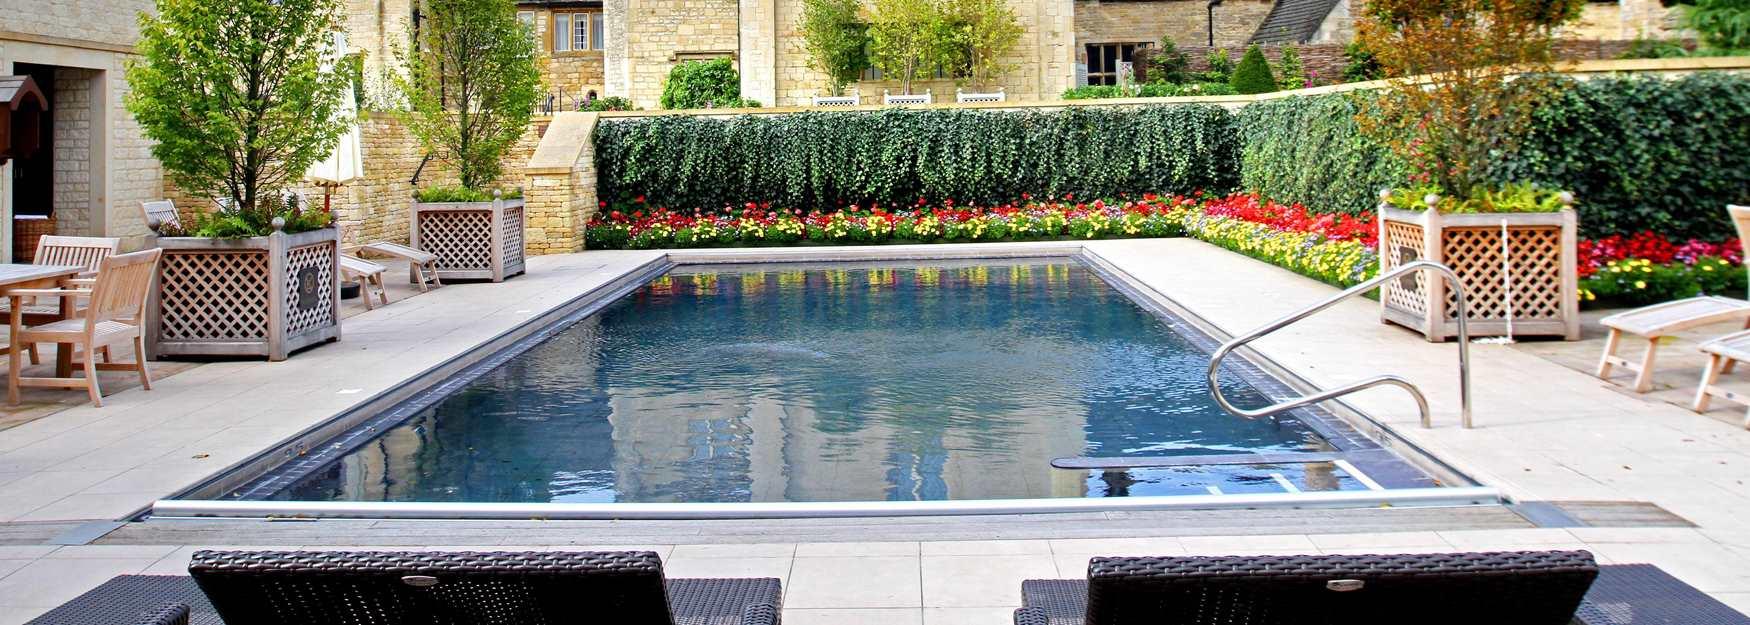 Ellenborough Park Outdoor Pool